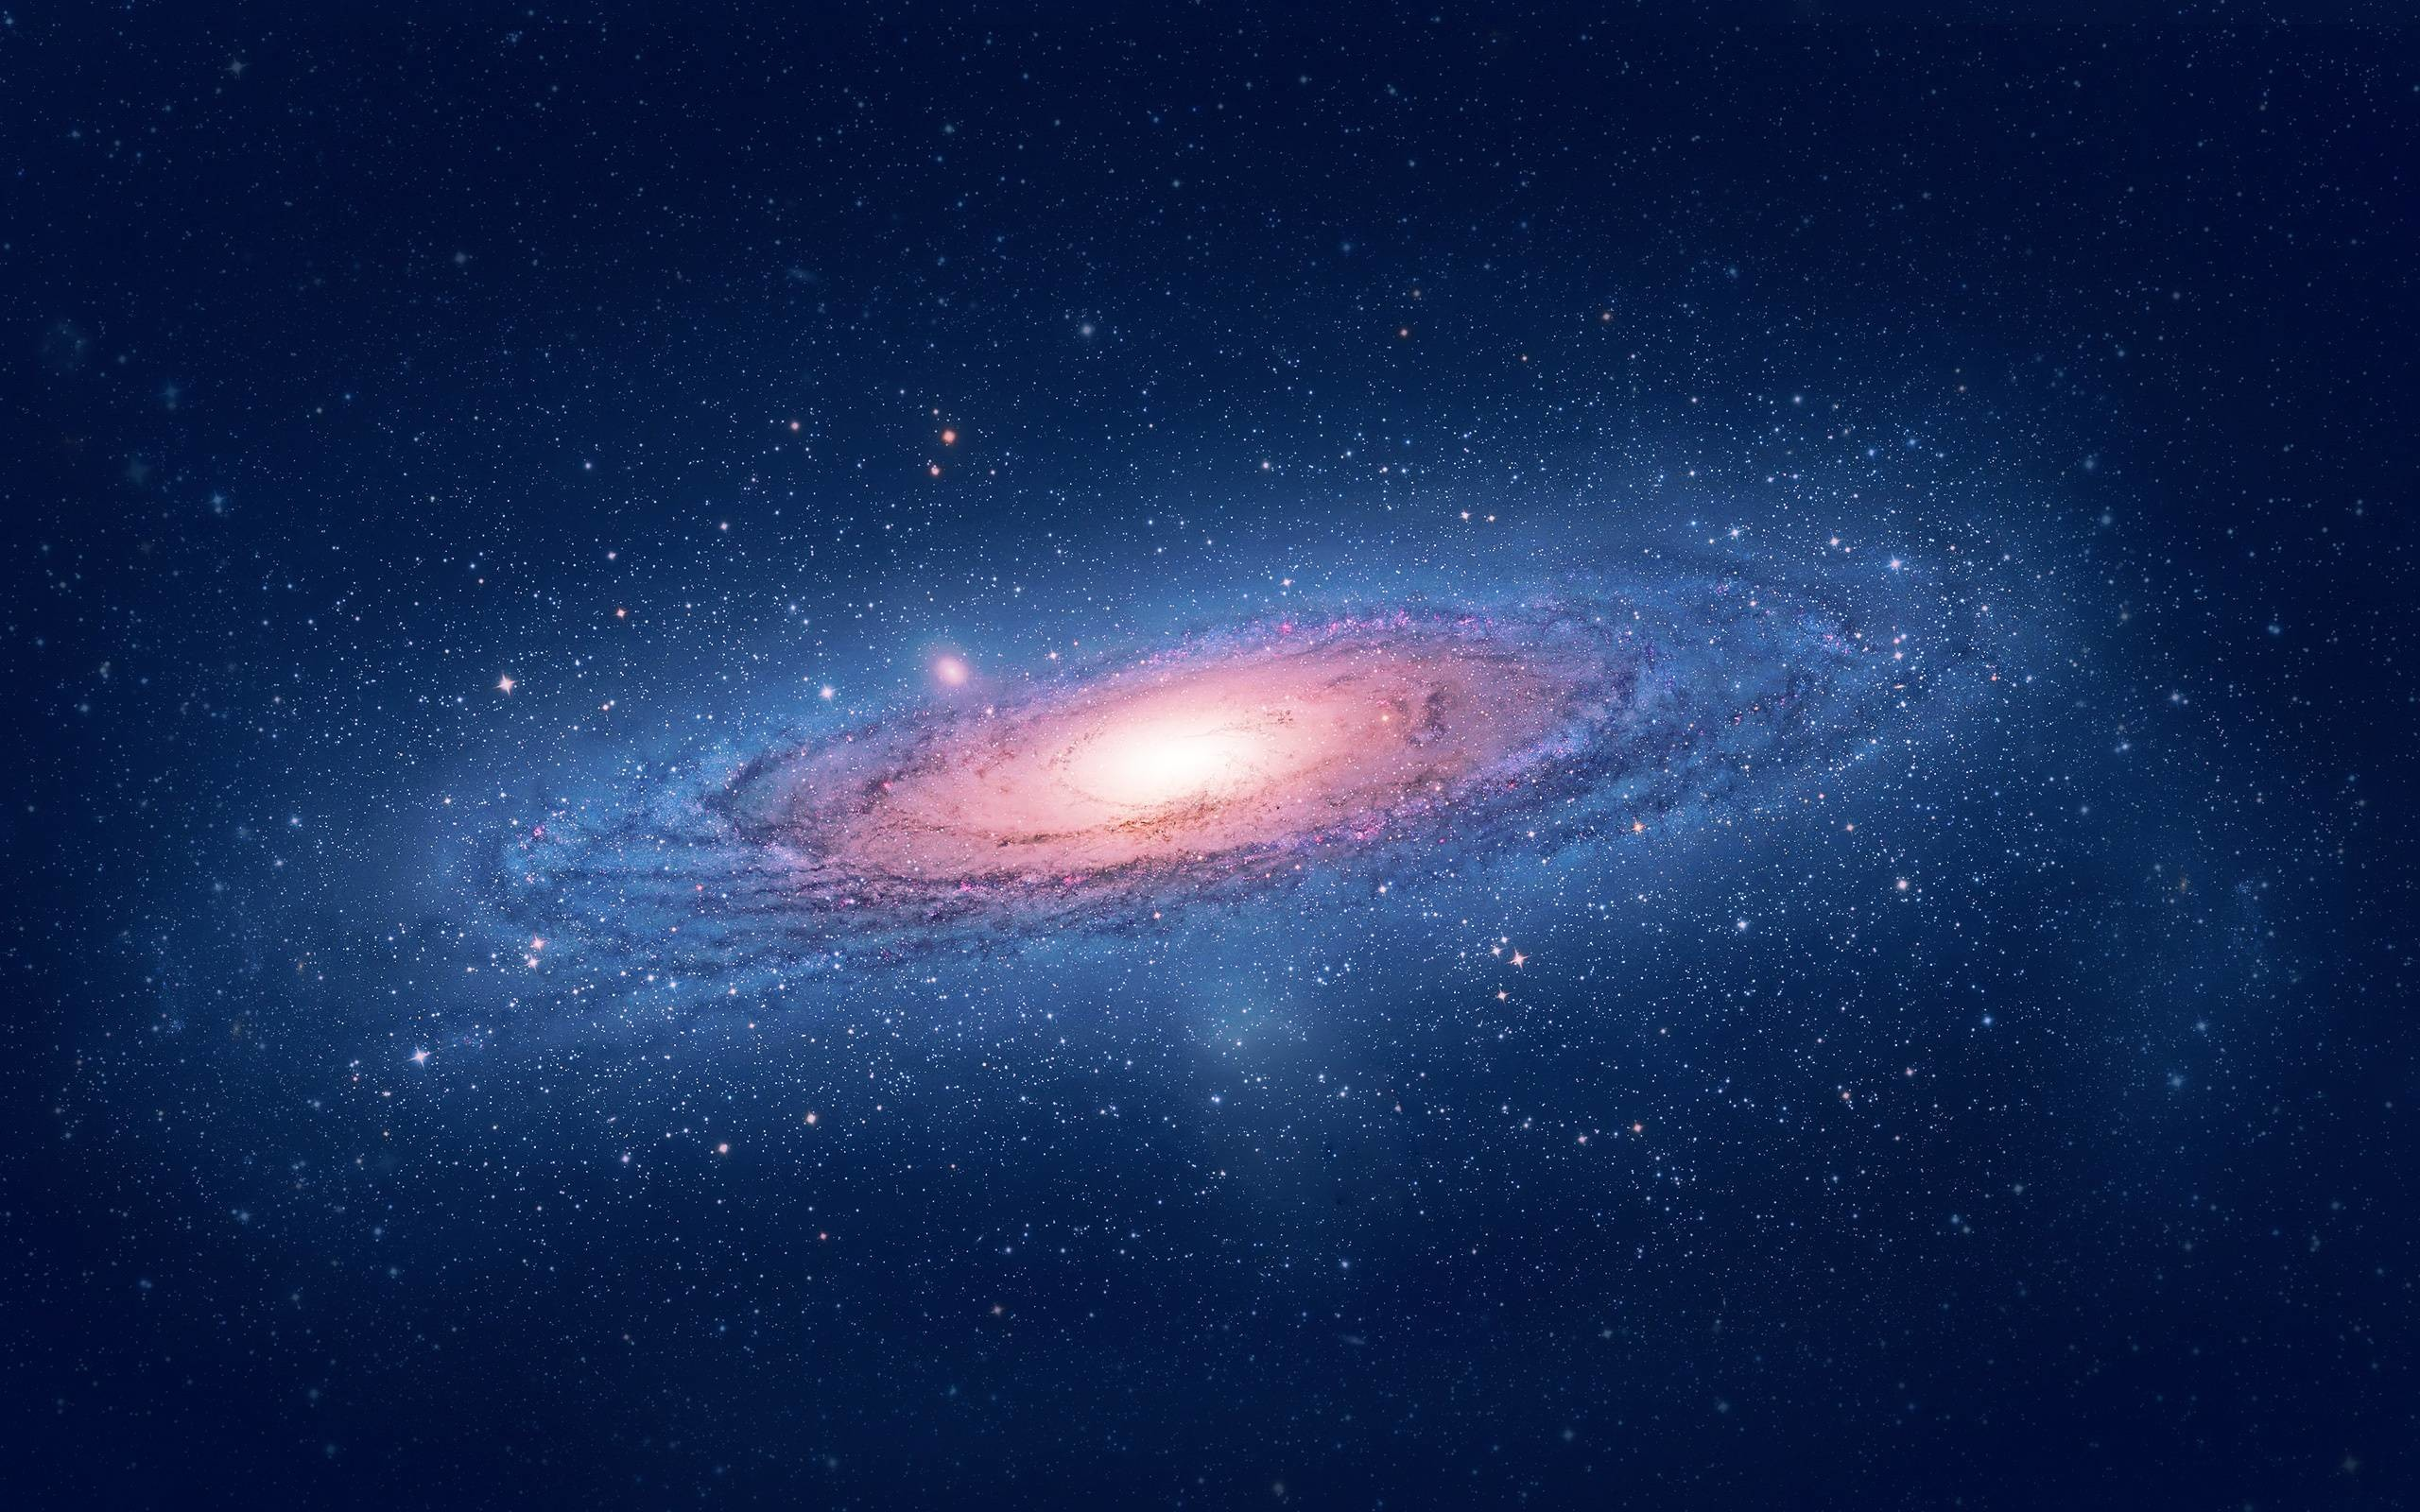 Space Wallpaper, stars, constellations, planets desktop | Wallpapers